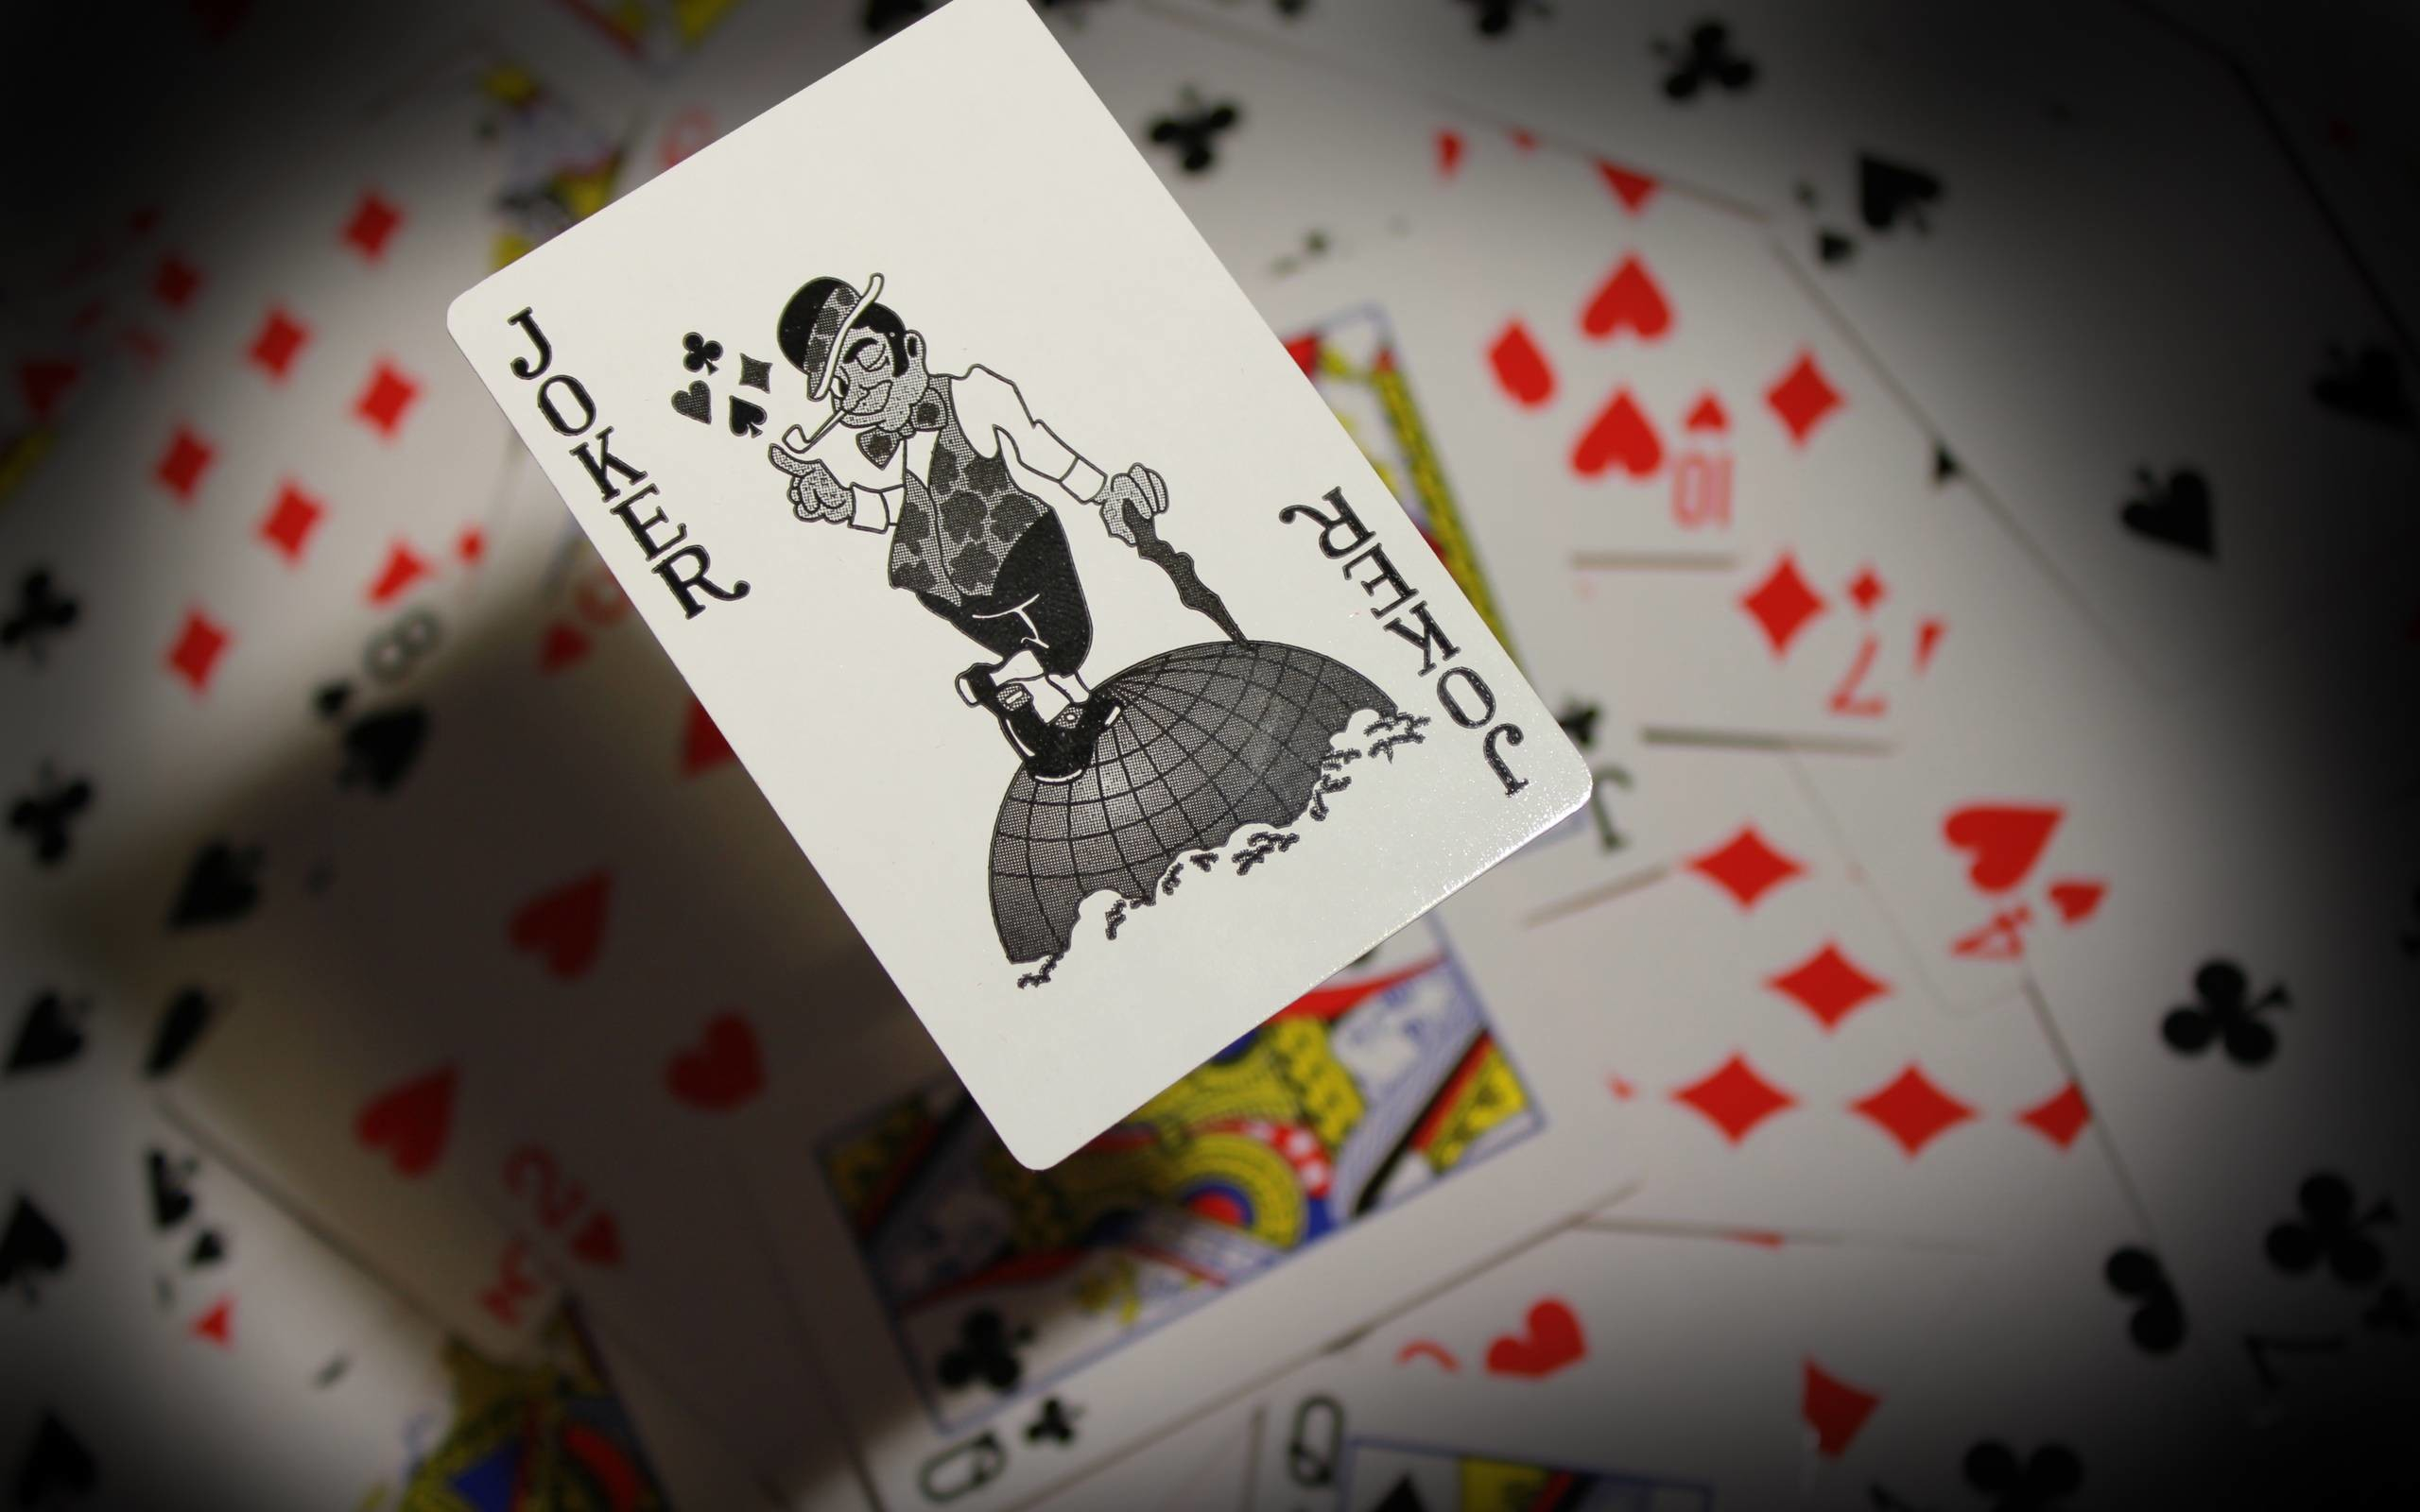 878088 download joker card wallpapers